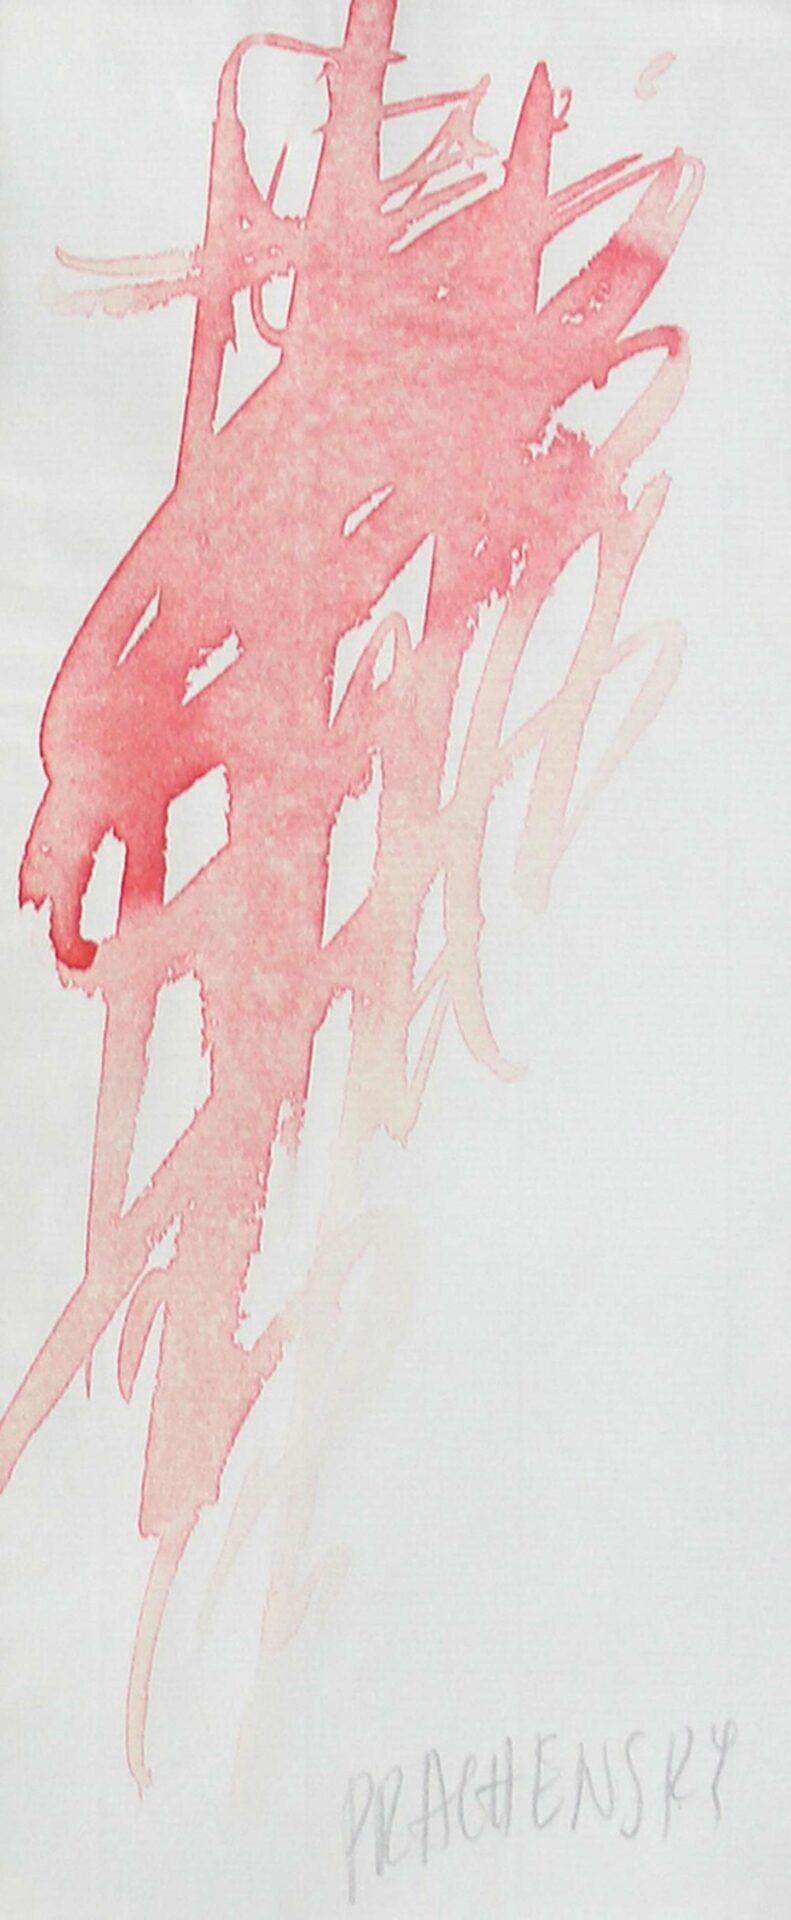 Markus Prachensky: Komposition in Rot   ARGUS Art Asset Austria, Wien